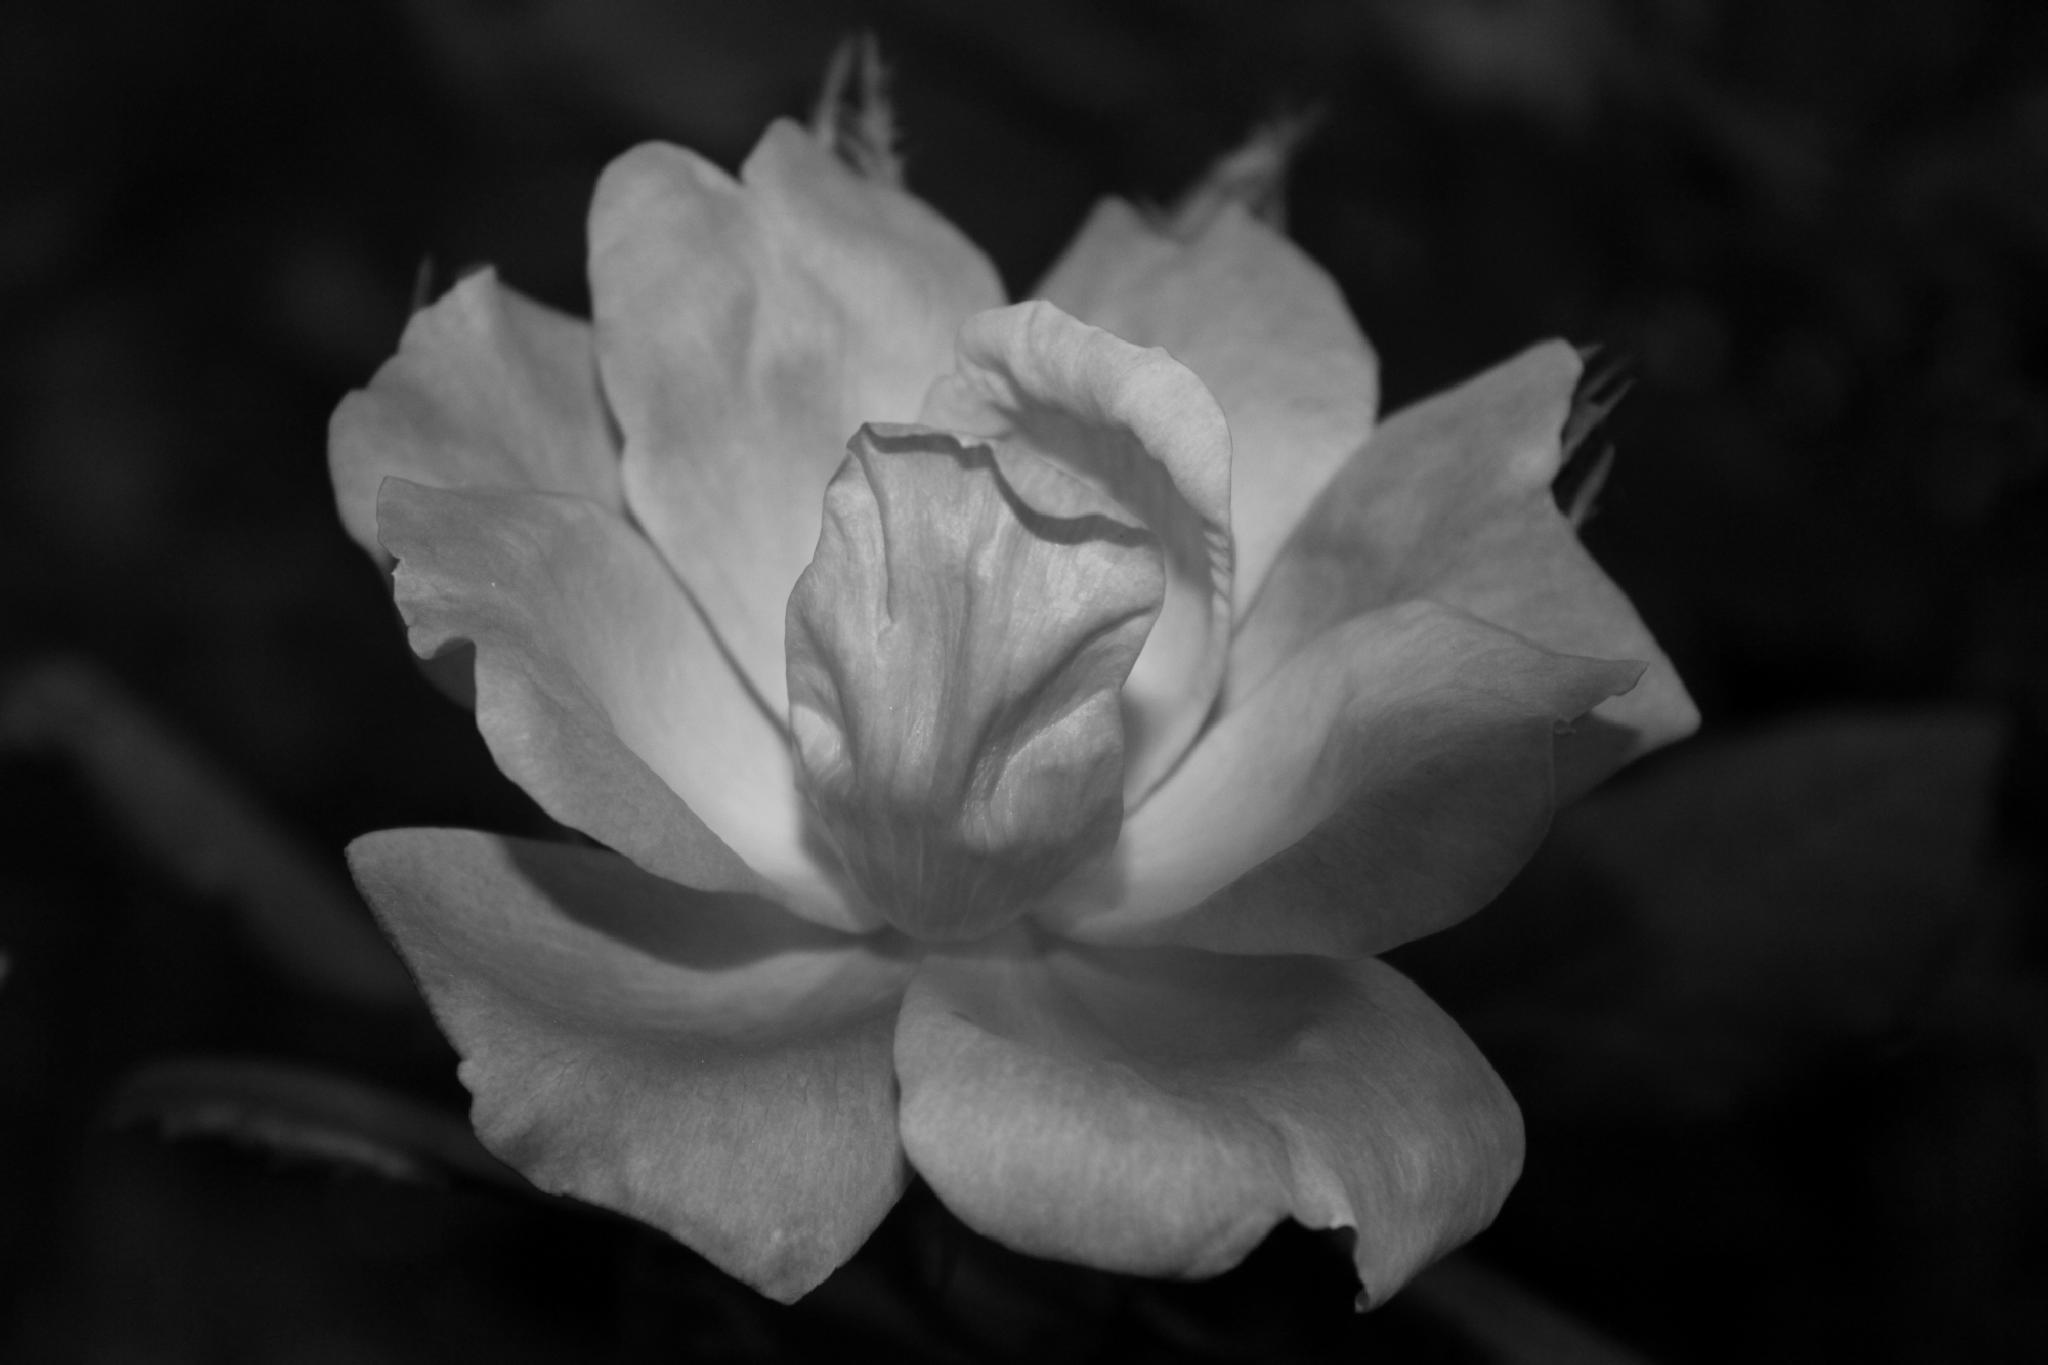 Blush Rose by christie.henderson.5